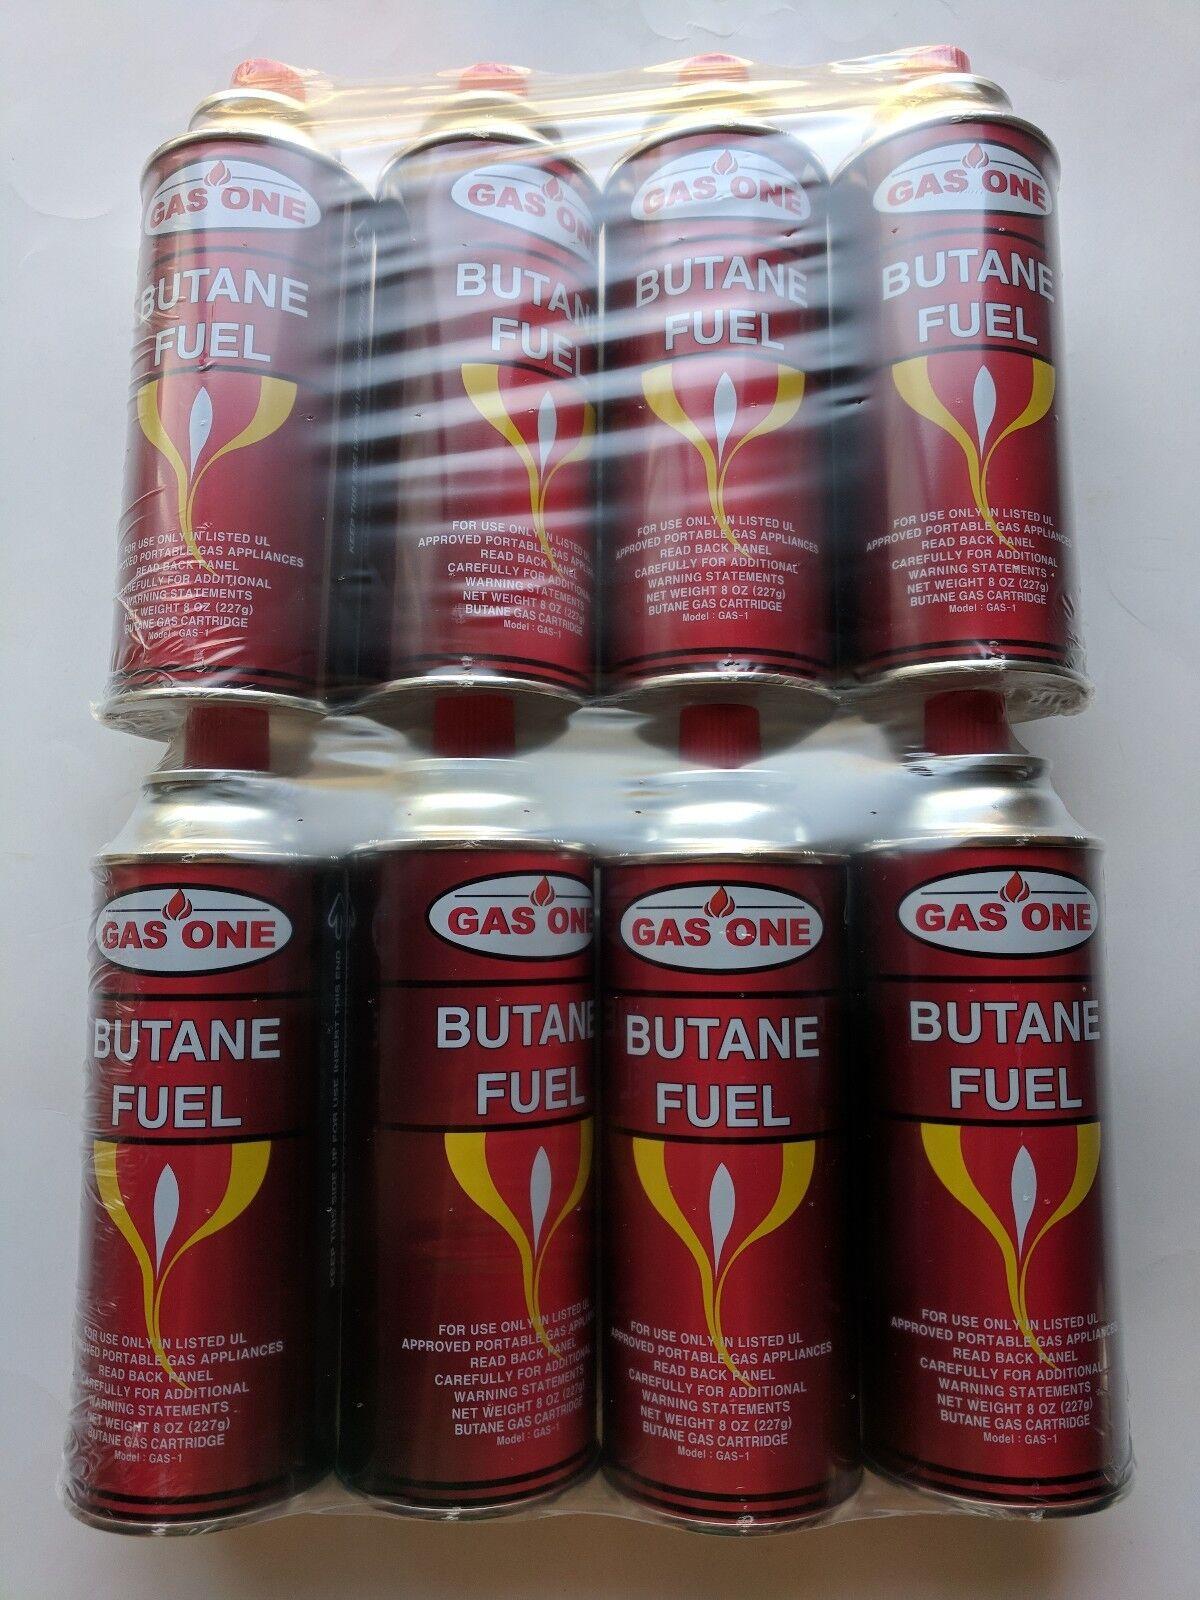 GasOne Butane Fuel Portable Stove Burner Camping 8 oz Canist